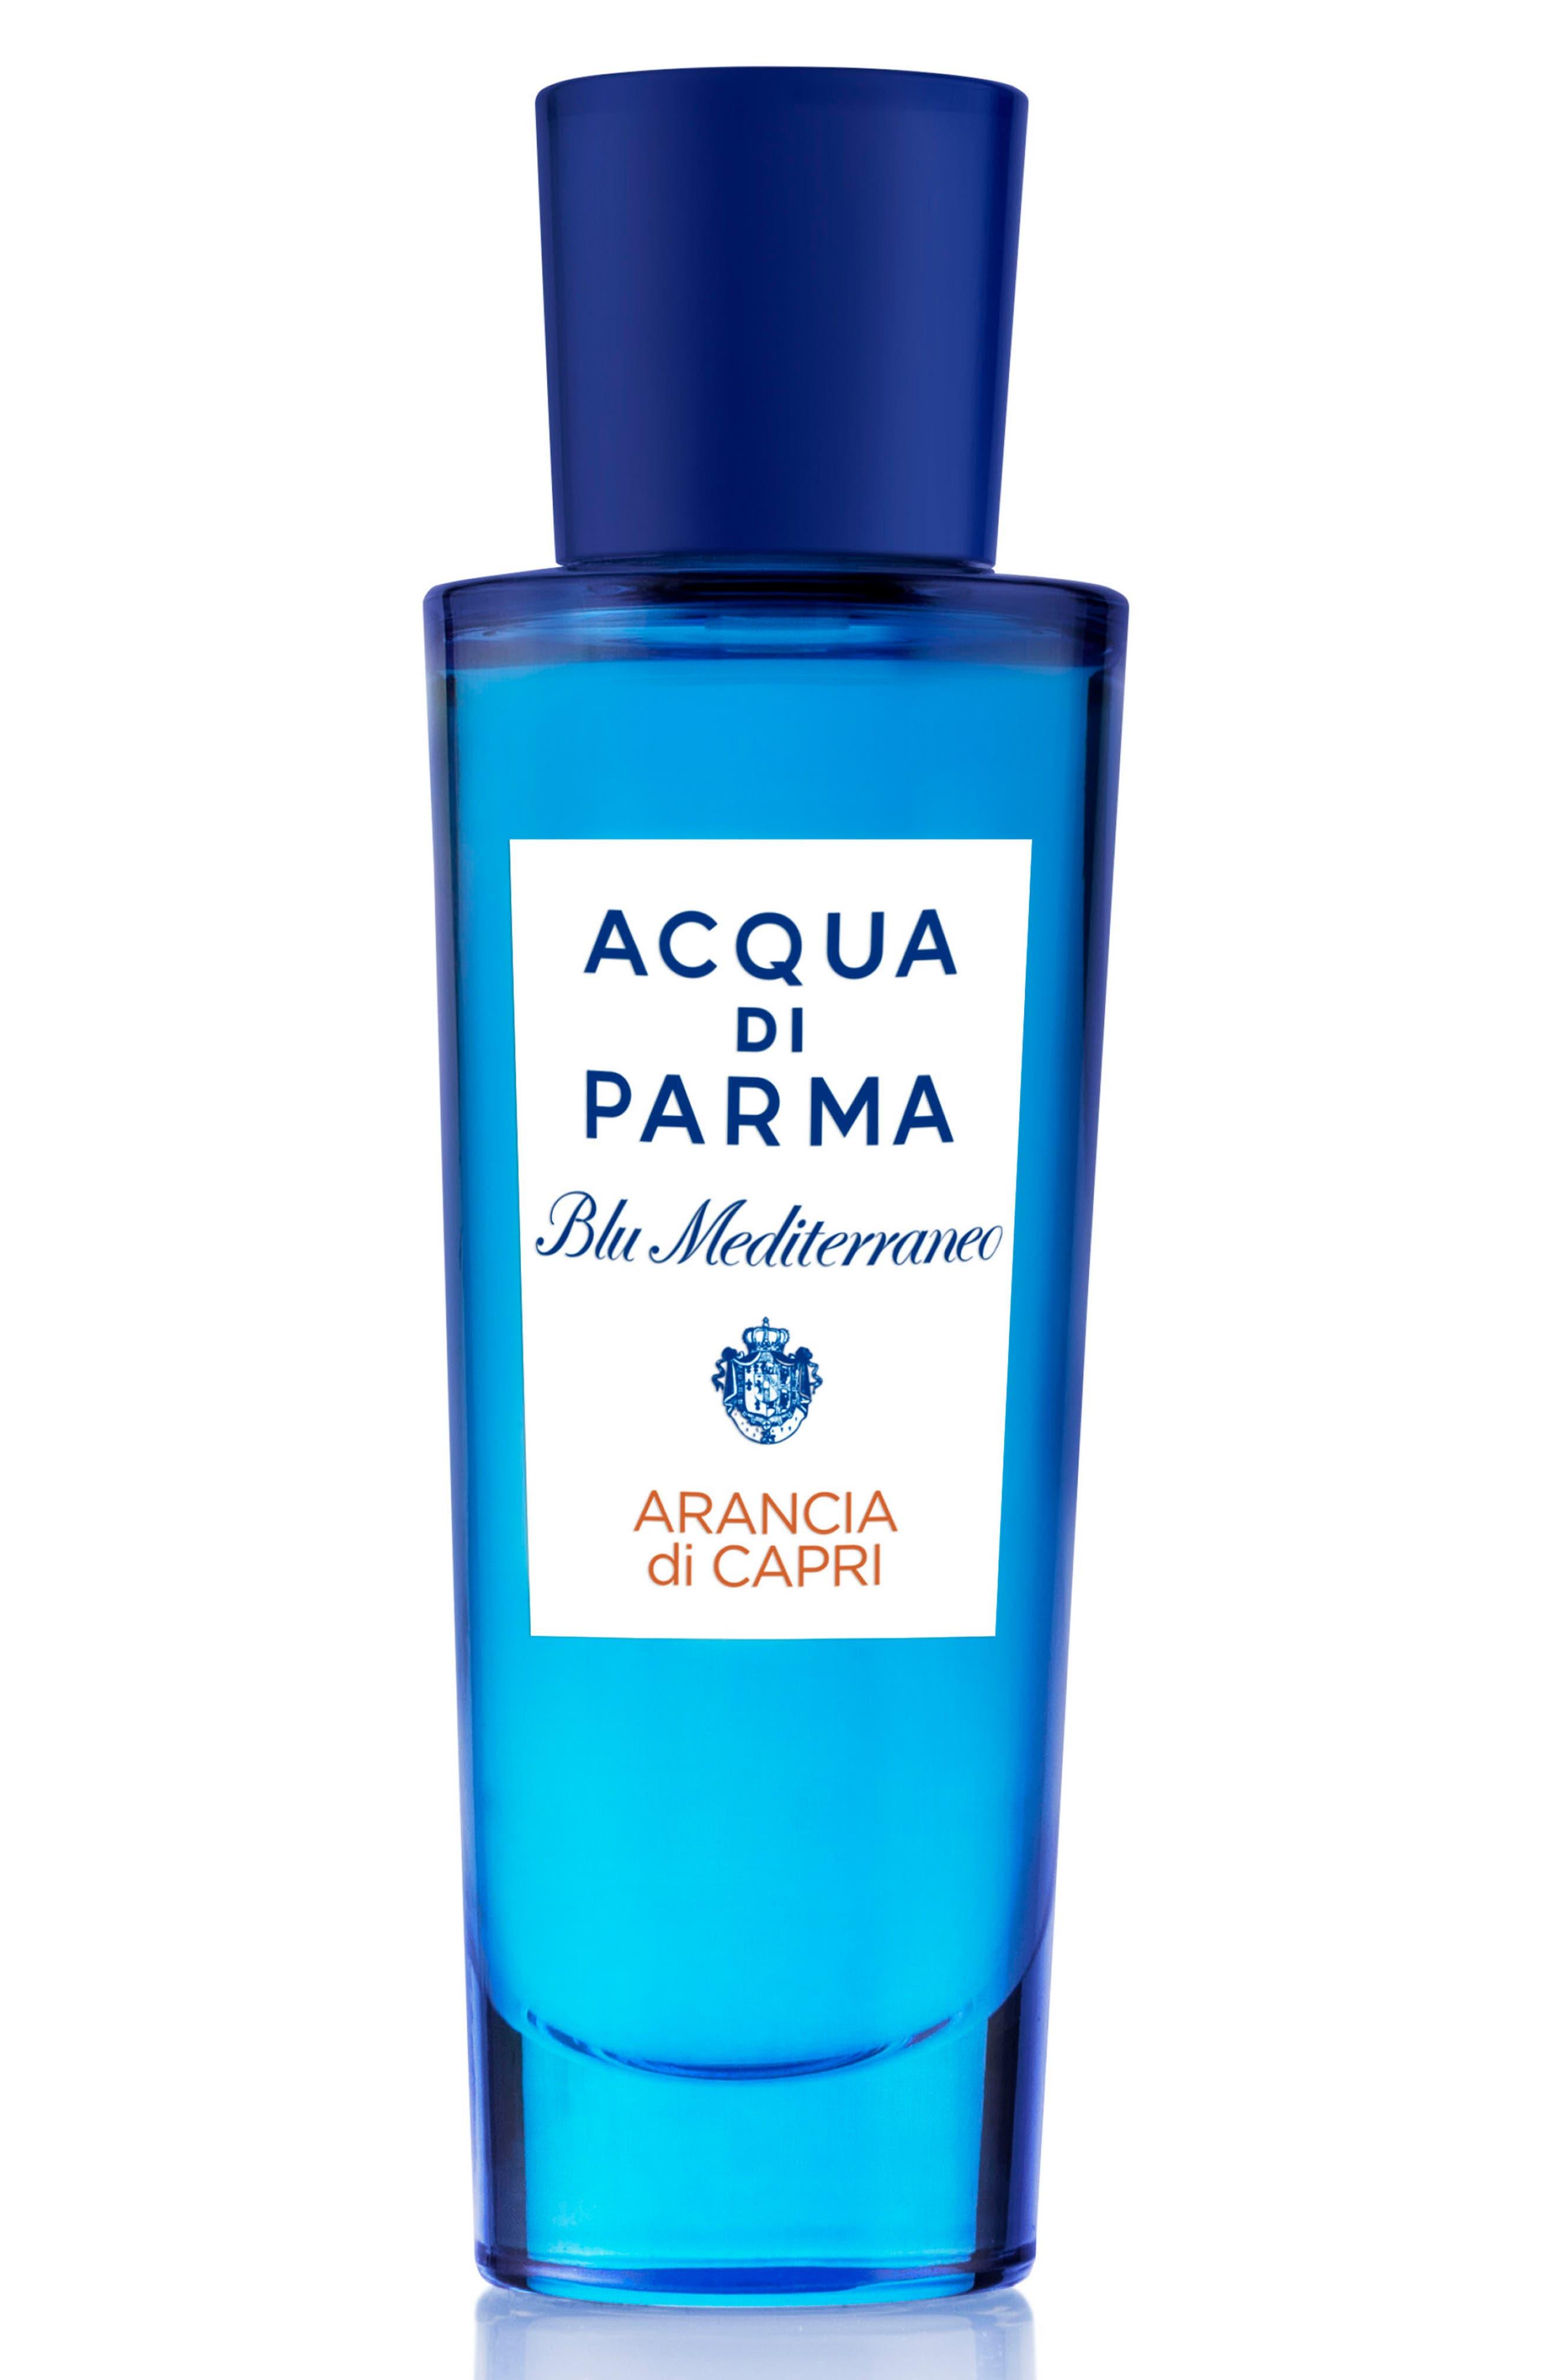 ACQUA DI PARMA, Blu Mediterraneo Arancia di Capri Eau de Toilette, Alternate thumbnail 5, color, NO COLOR